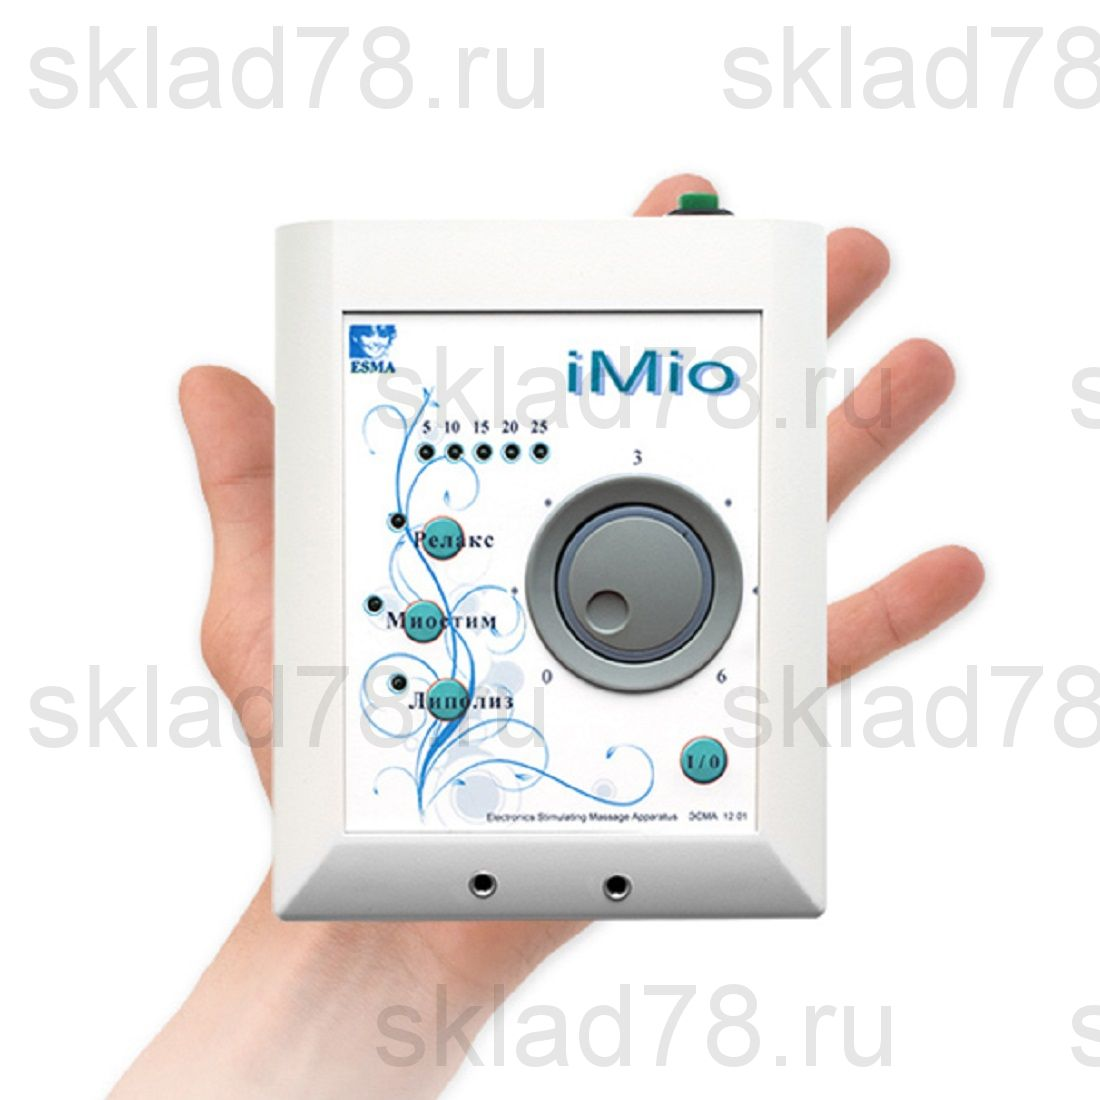 Миостимулятор ESMA 12.01 модель IMio